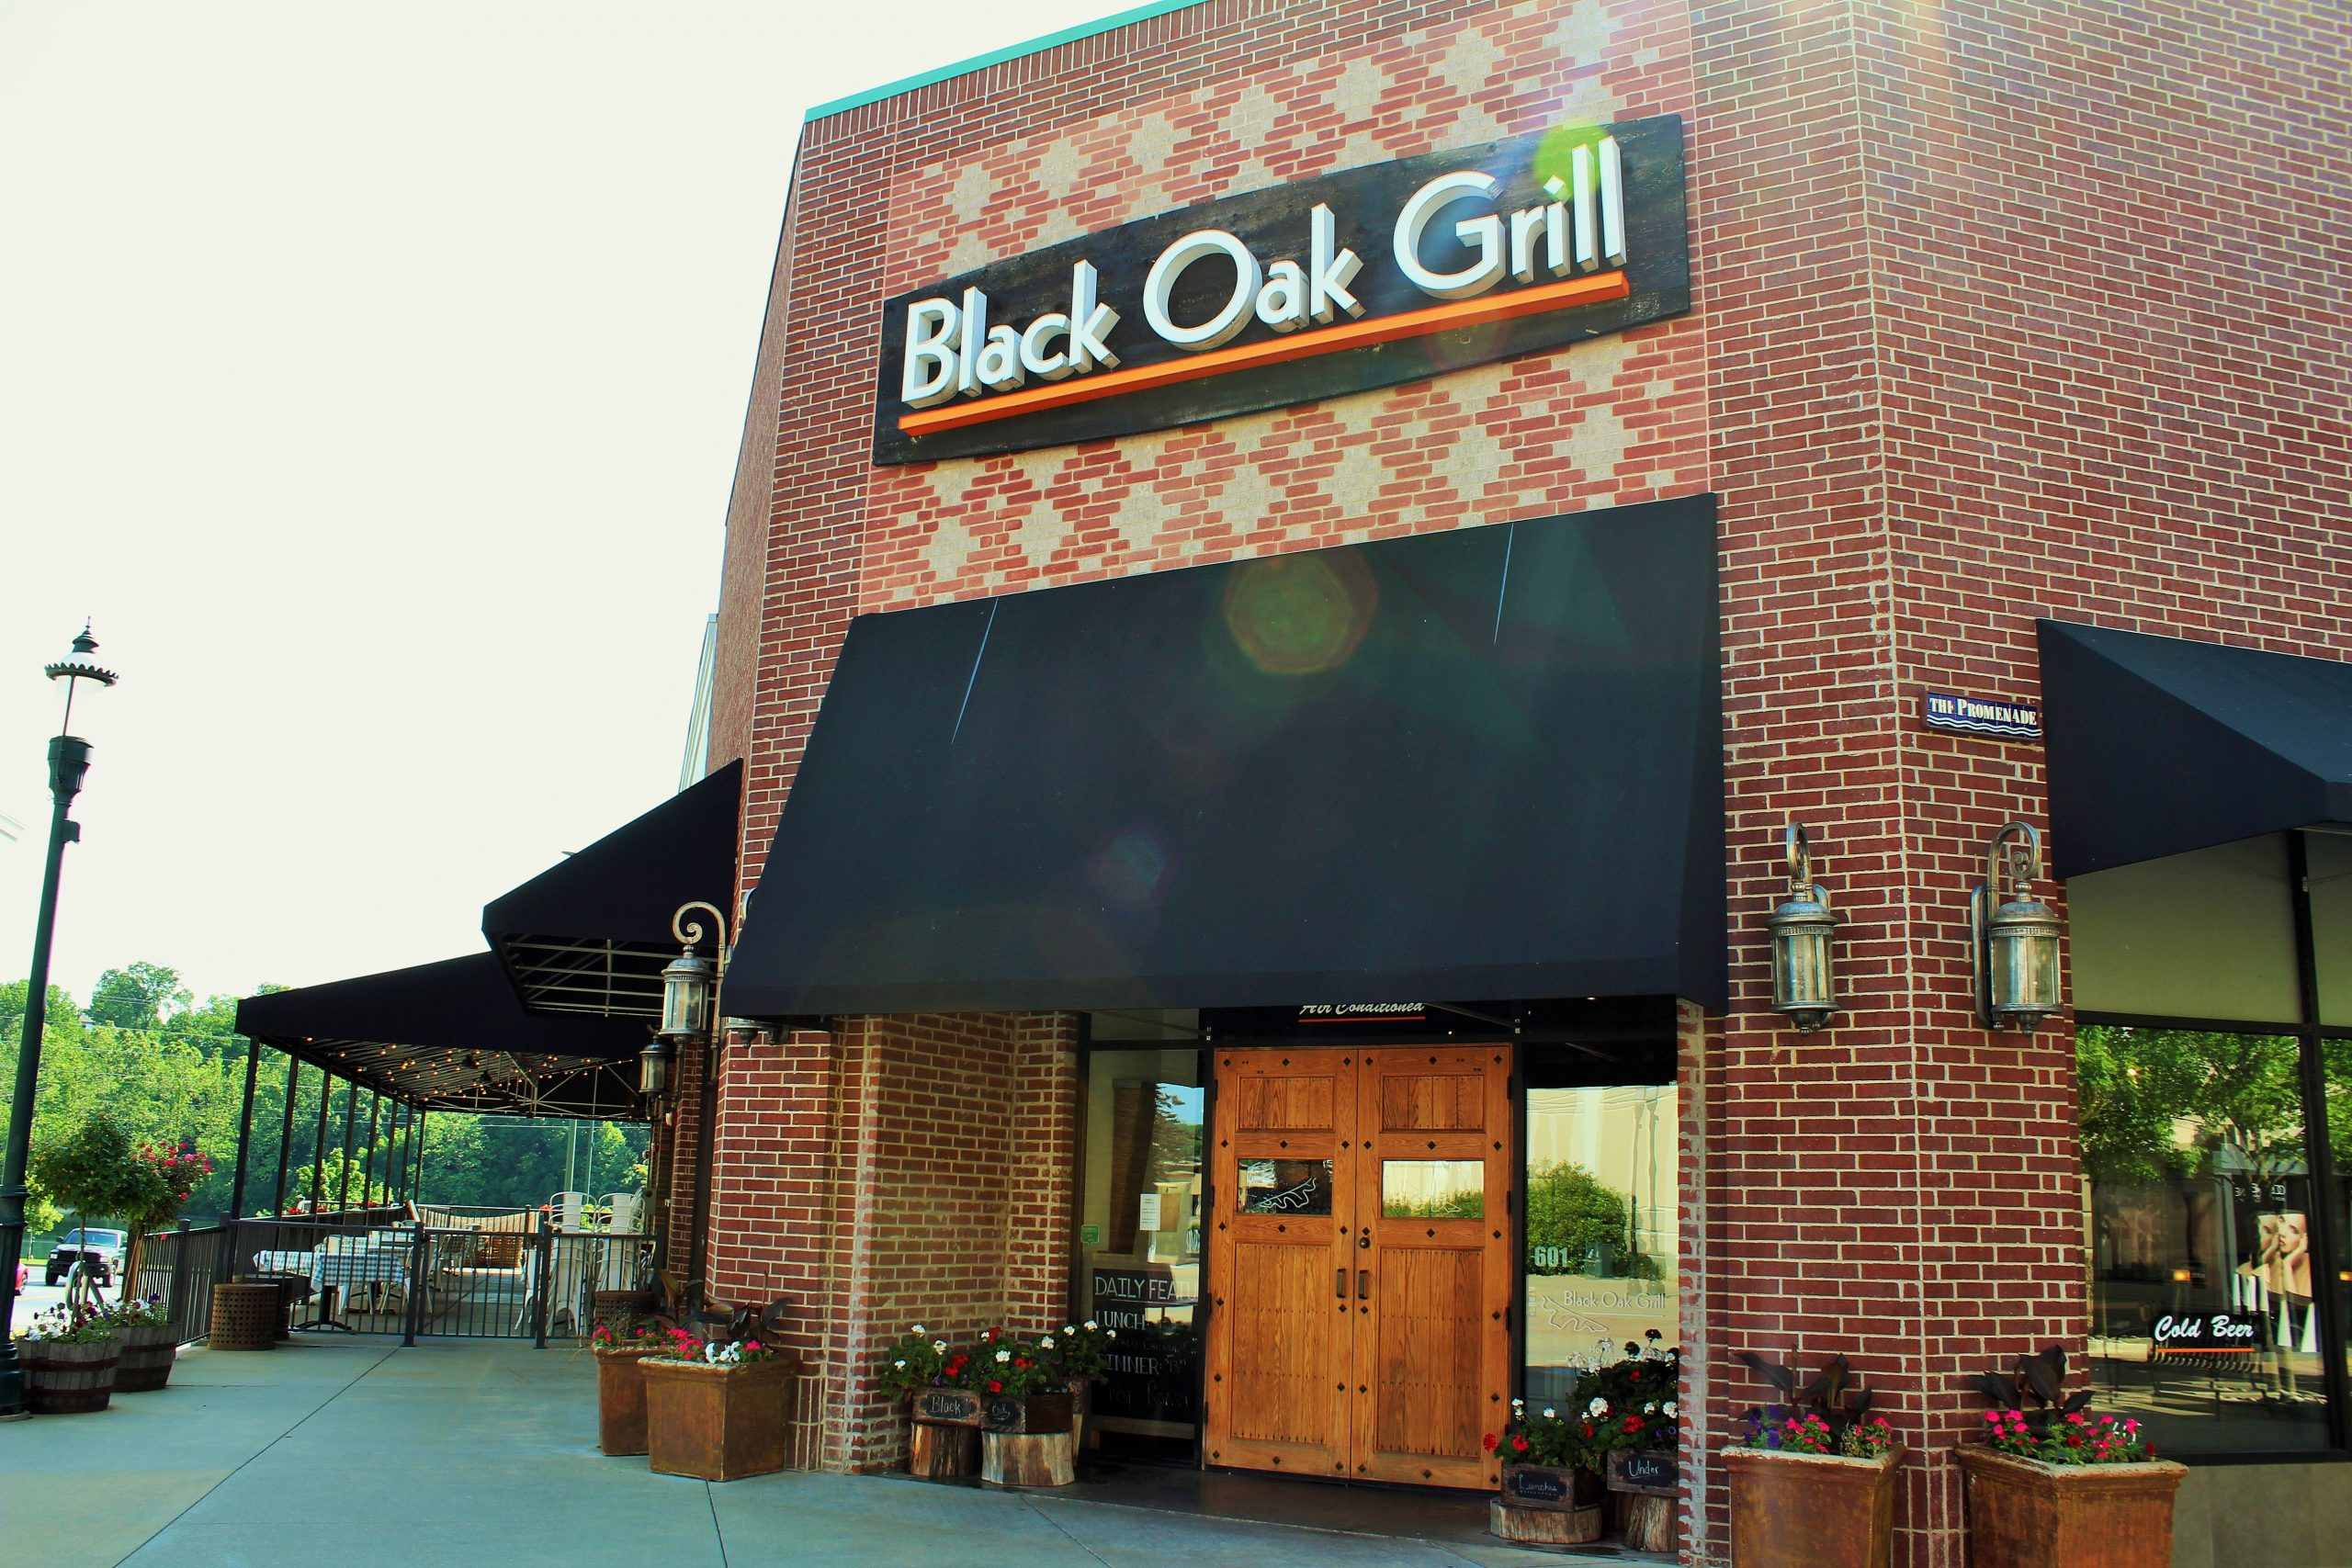 Black_Oak_Grill_Branson_Missouri_Restaurants